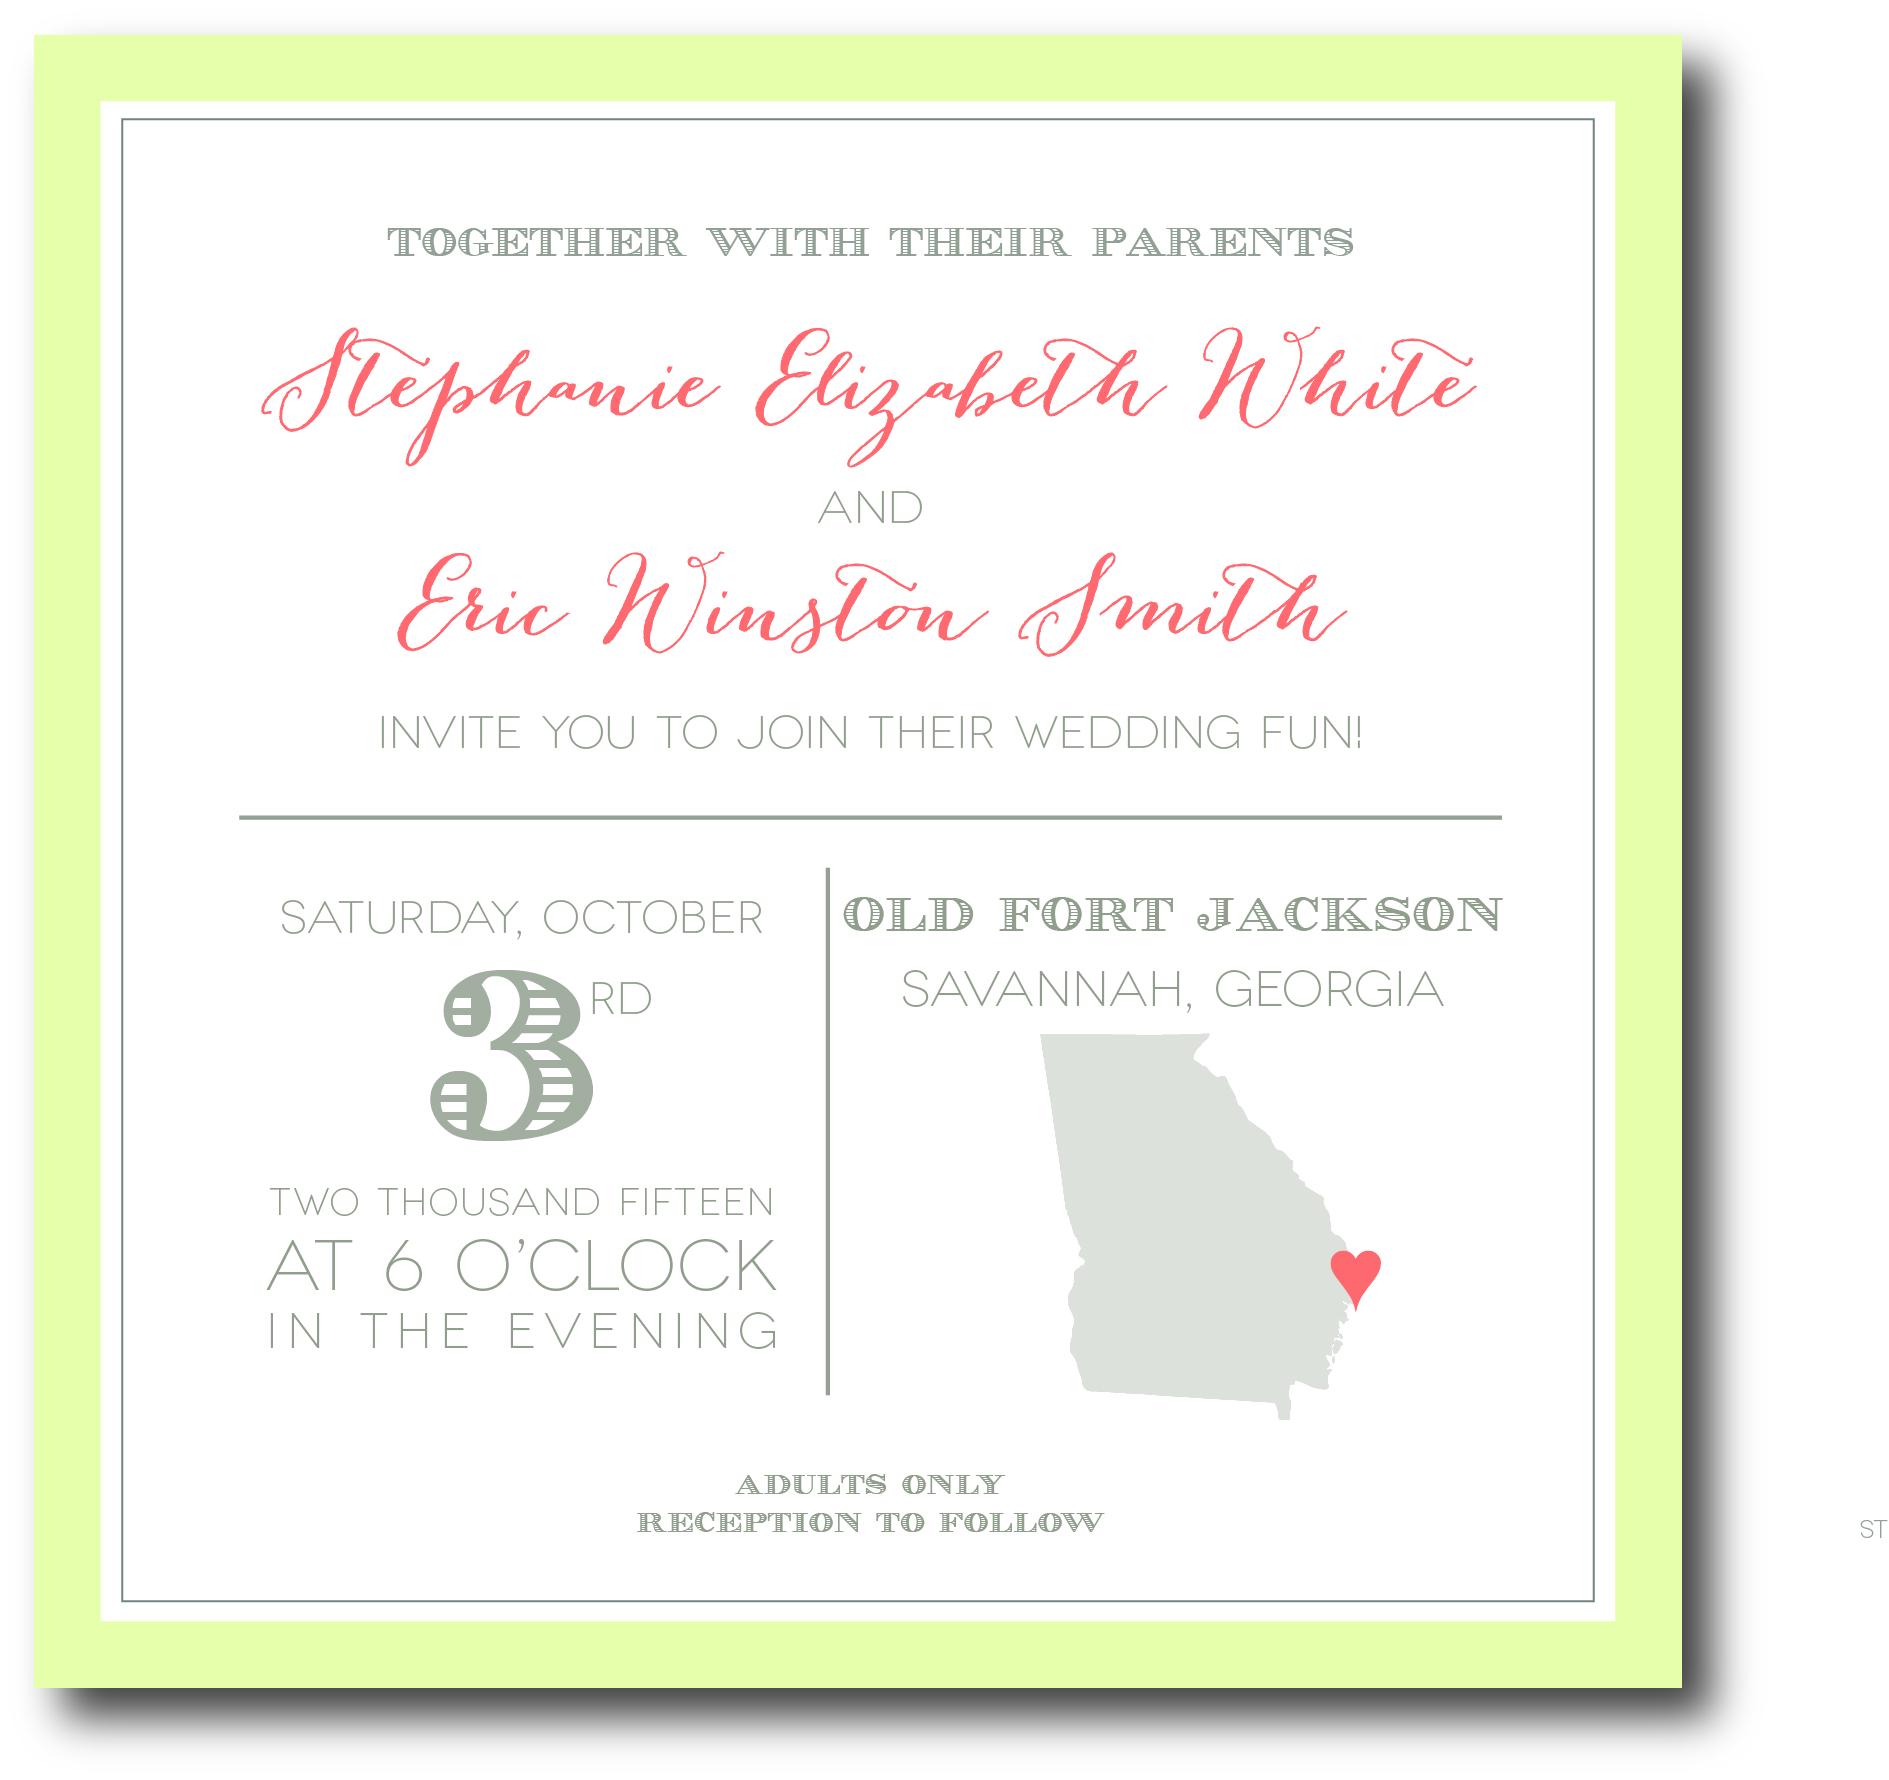 StephanieW.Wedding.jpg